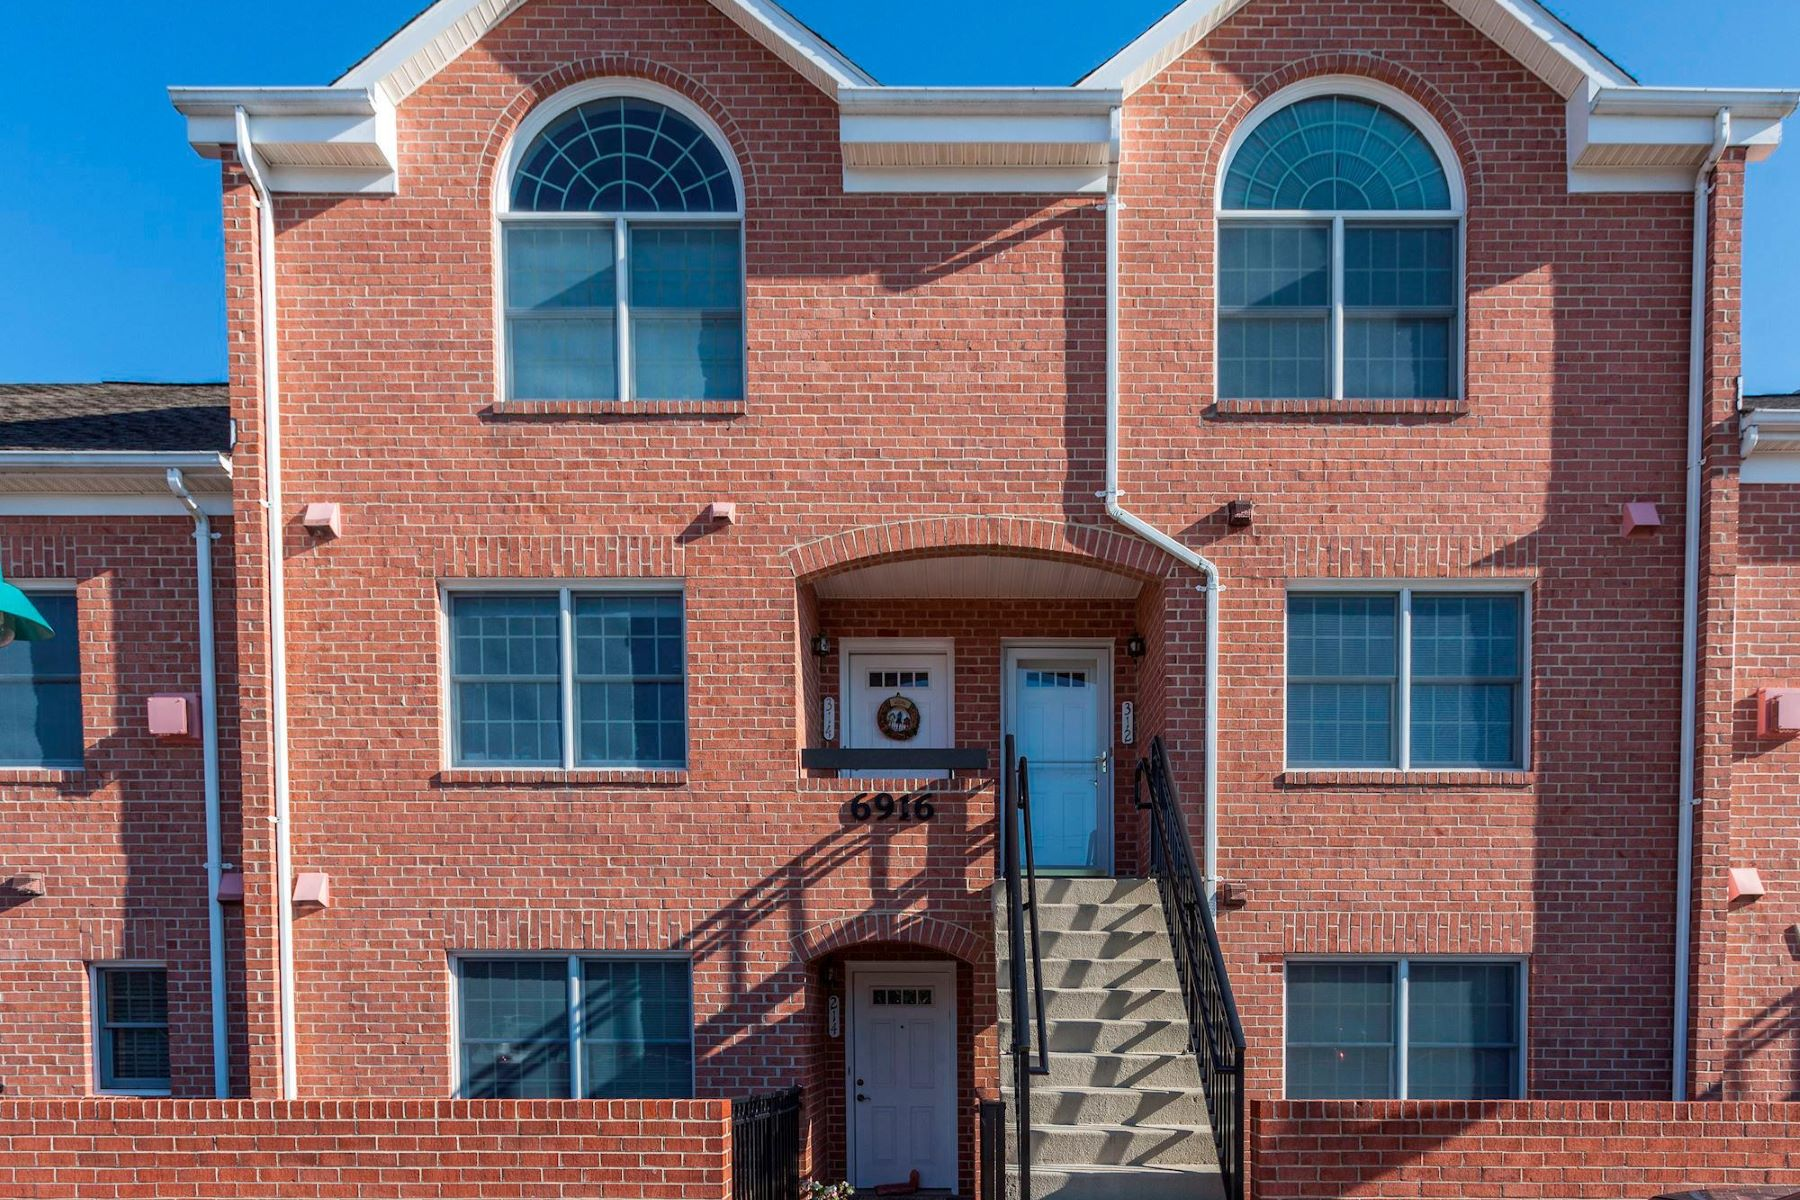 Townhouse for Sale at 6916 Fairfax Dr #312 6916 Fairfax Dr #312 Arlington, Virginia 22213 United States